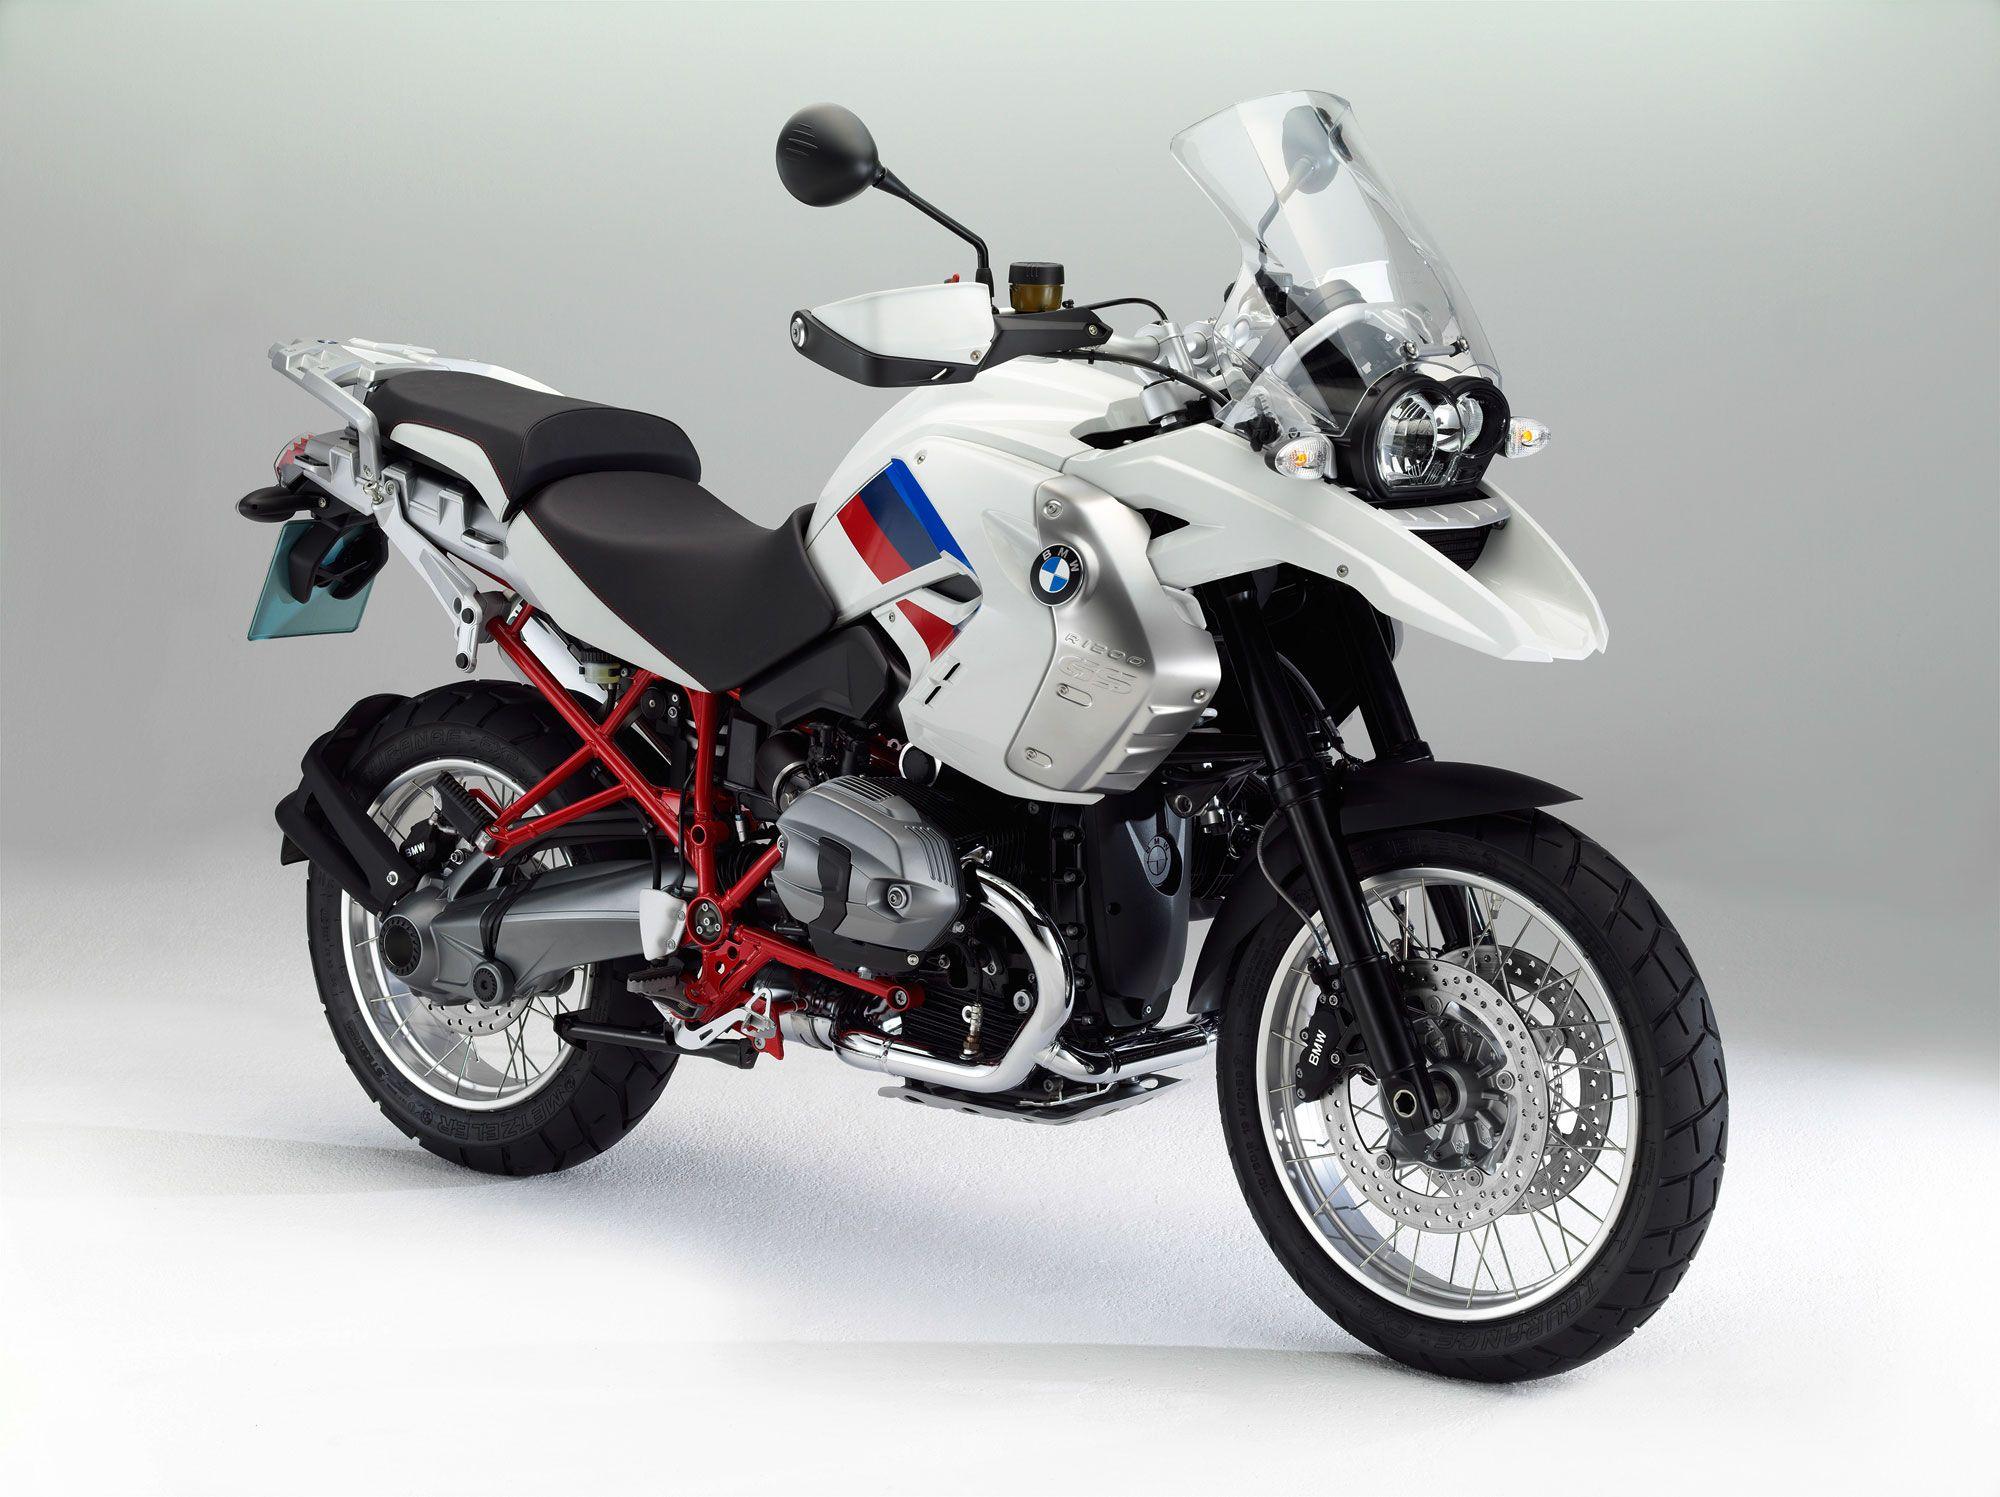 2012 Bmw R1200gs Rallye Bmw Motorrad Motorrad Motorrad Umbauten